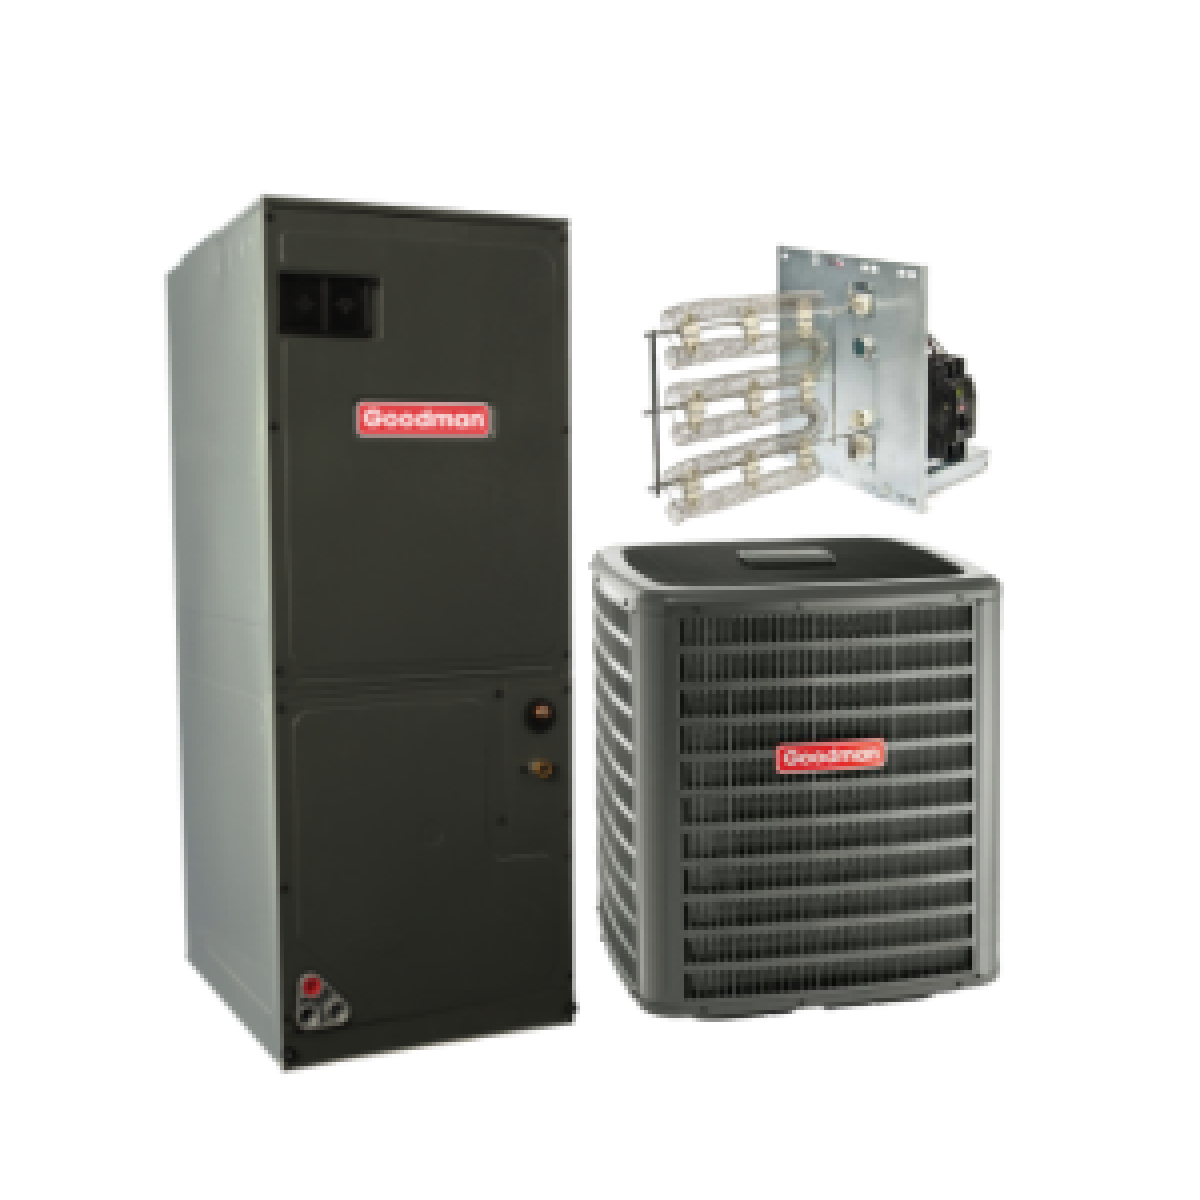 Goodman 4 0 Ton 14 Seer Heat Pump Split System 3 5 Ton